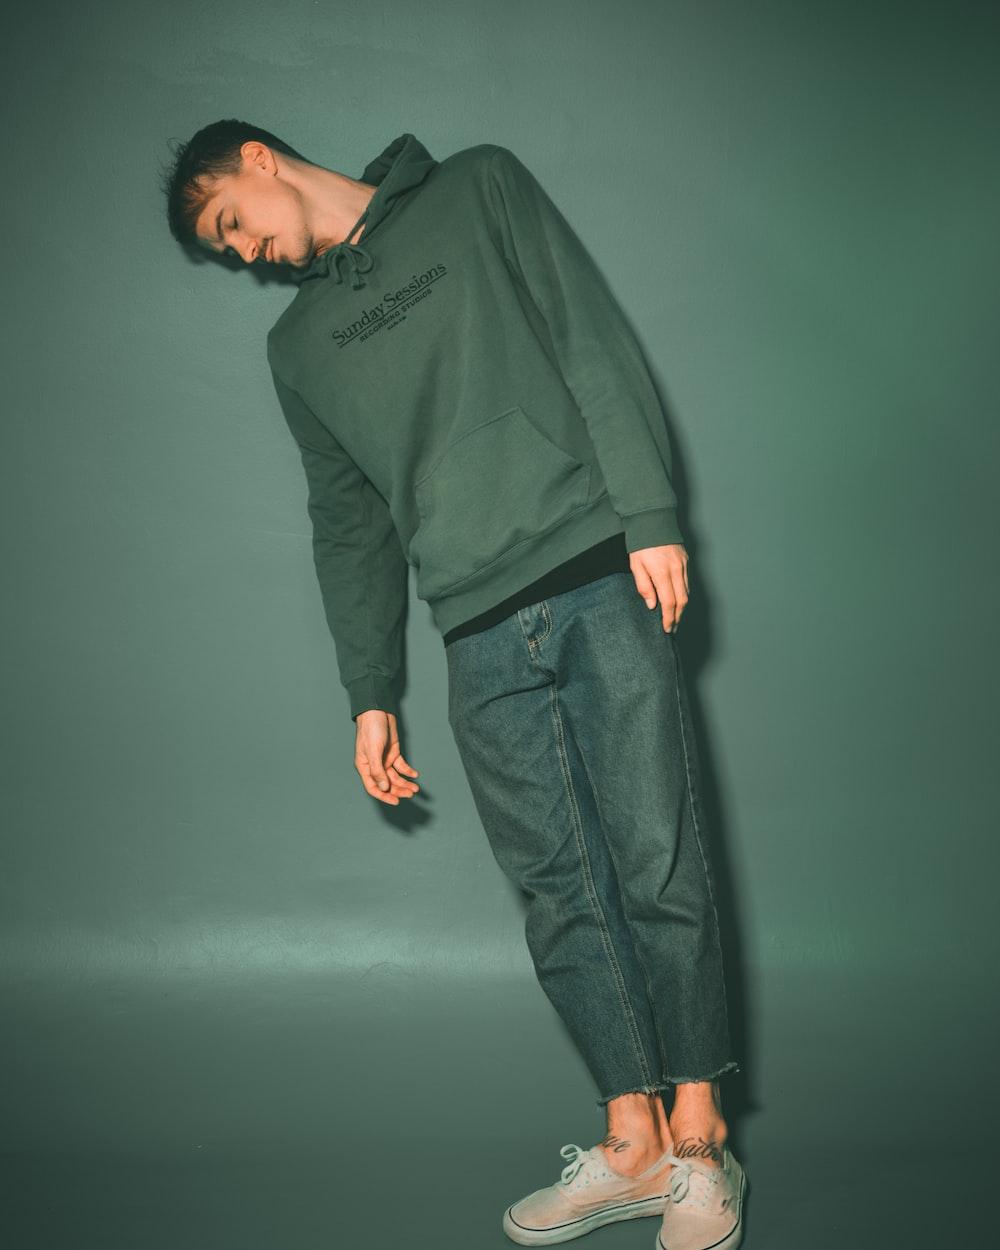 man in green long sleeve shirt and black pants